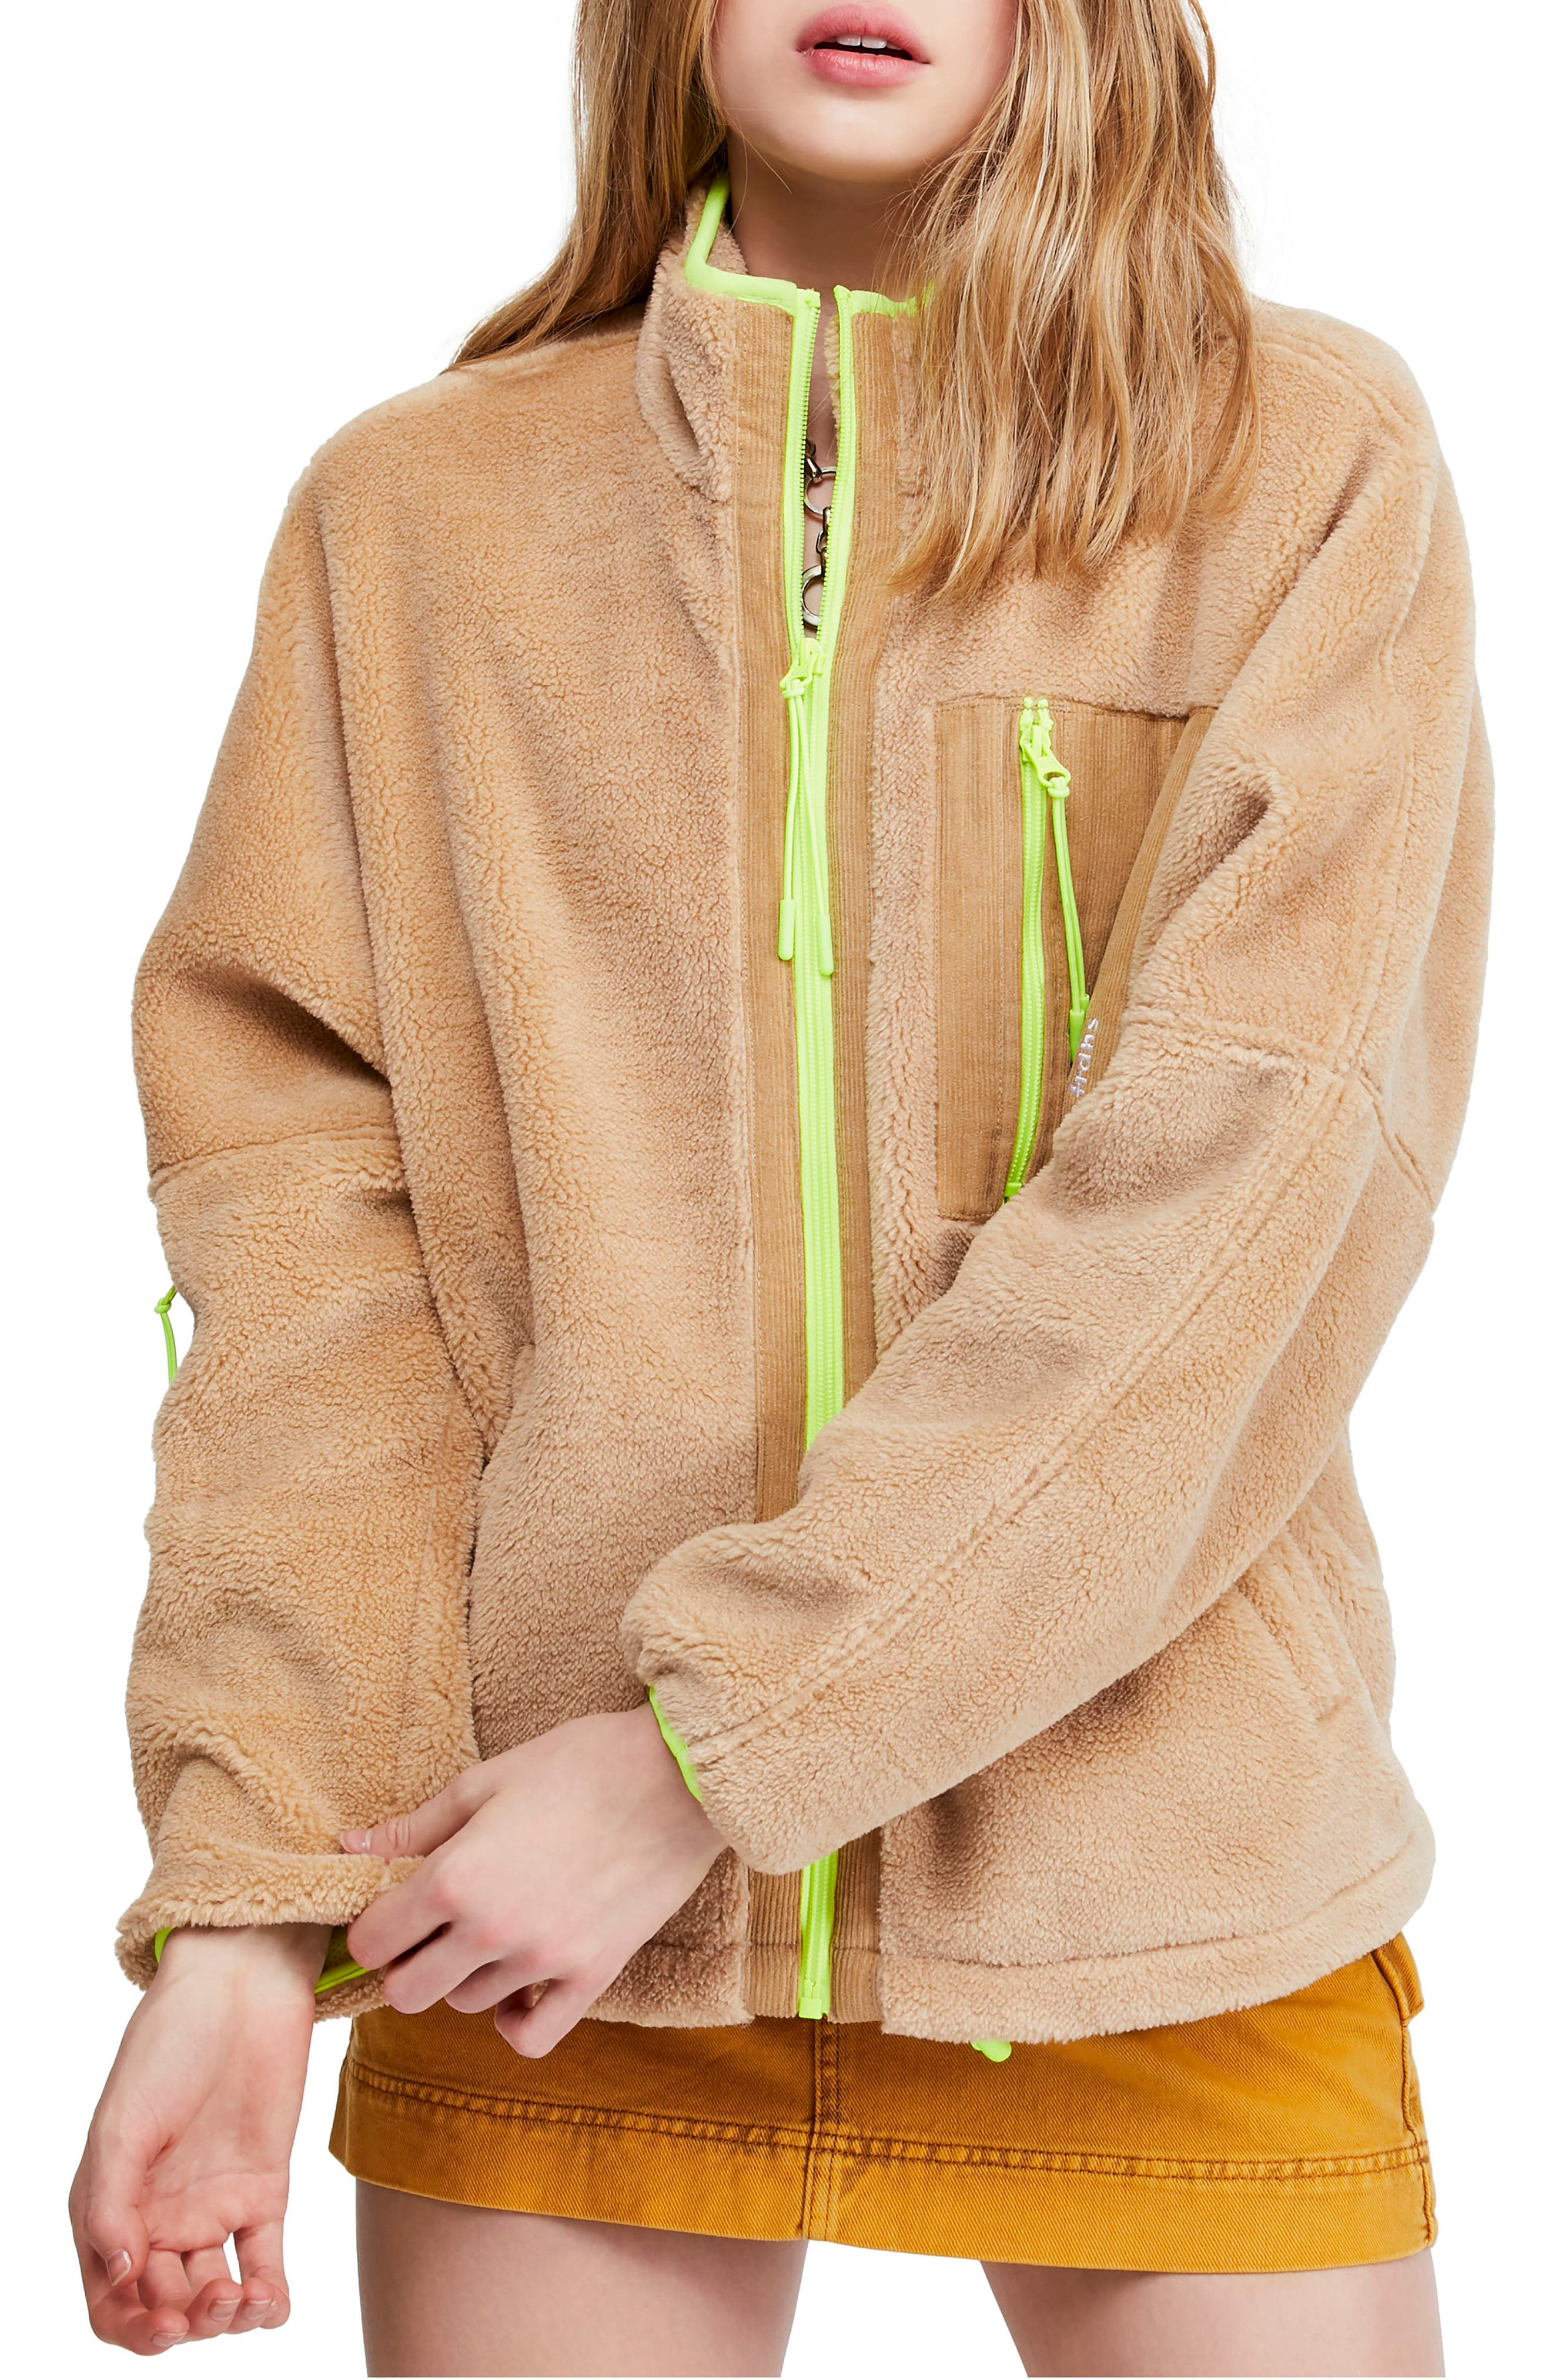 Bdg Urban Outfitters Corduroy Patch Fleece Jacket, Beige